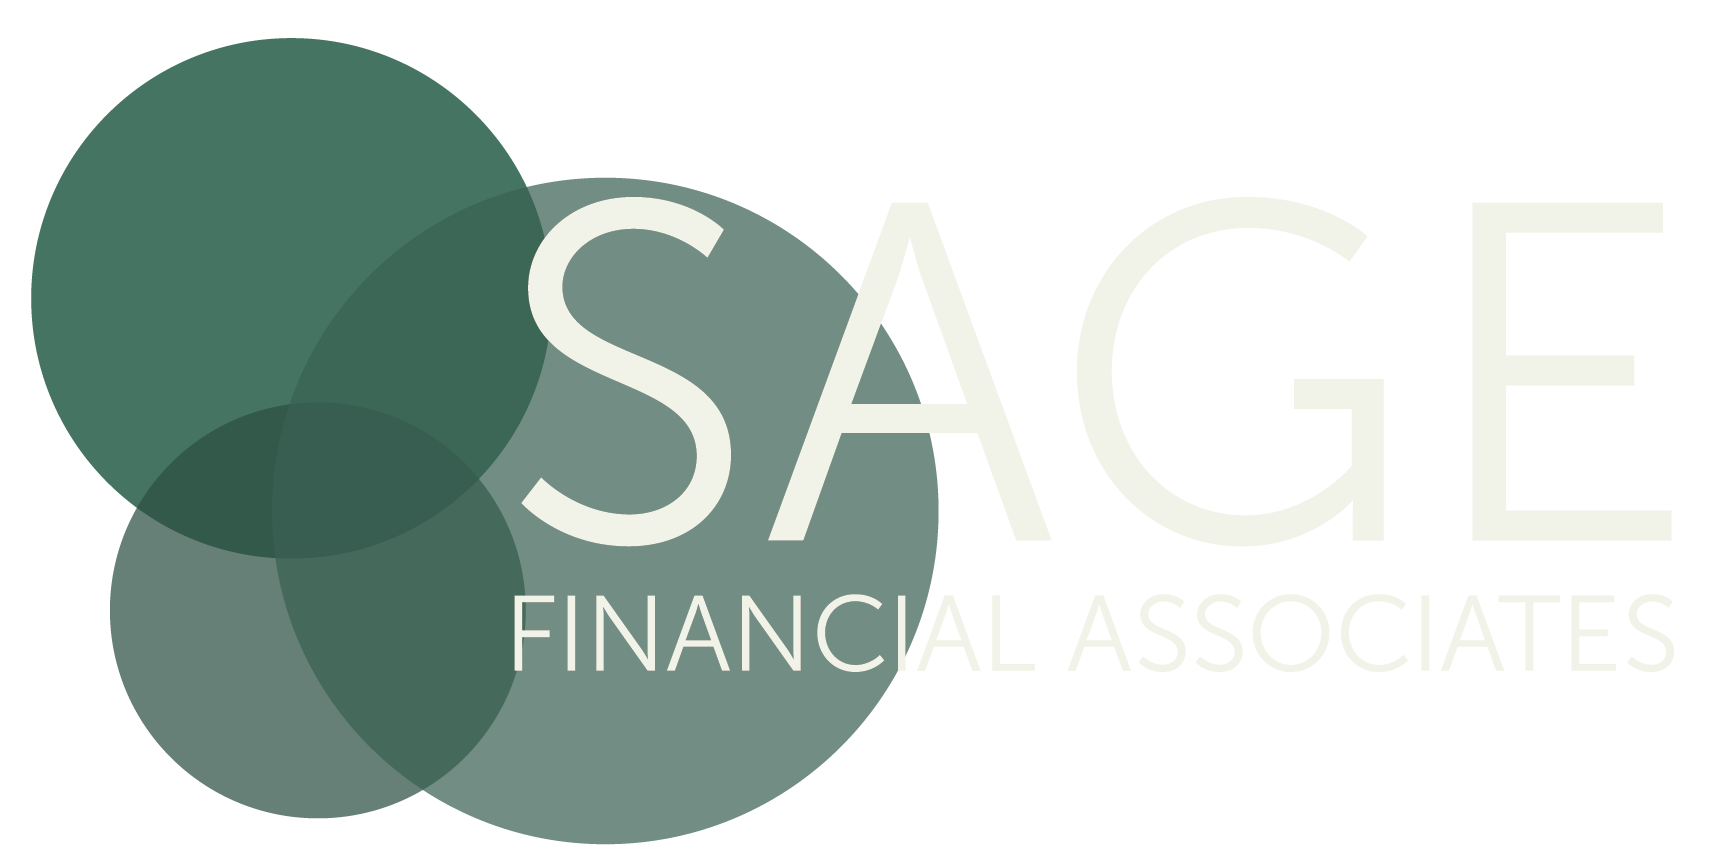 SAGE FINANCIAL ASSOCIATES